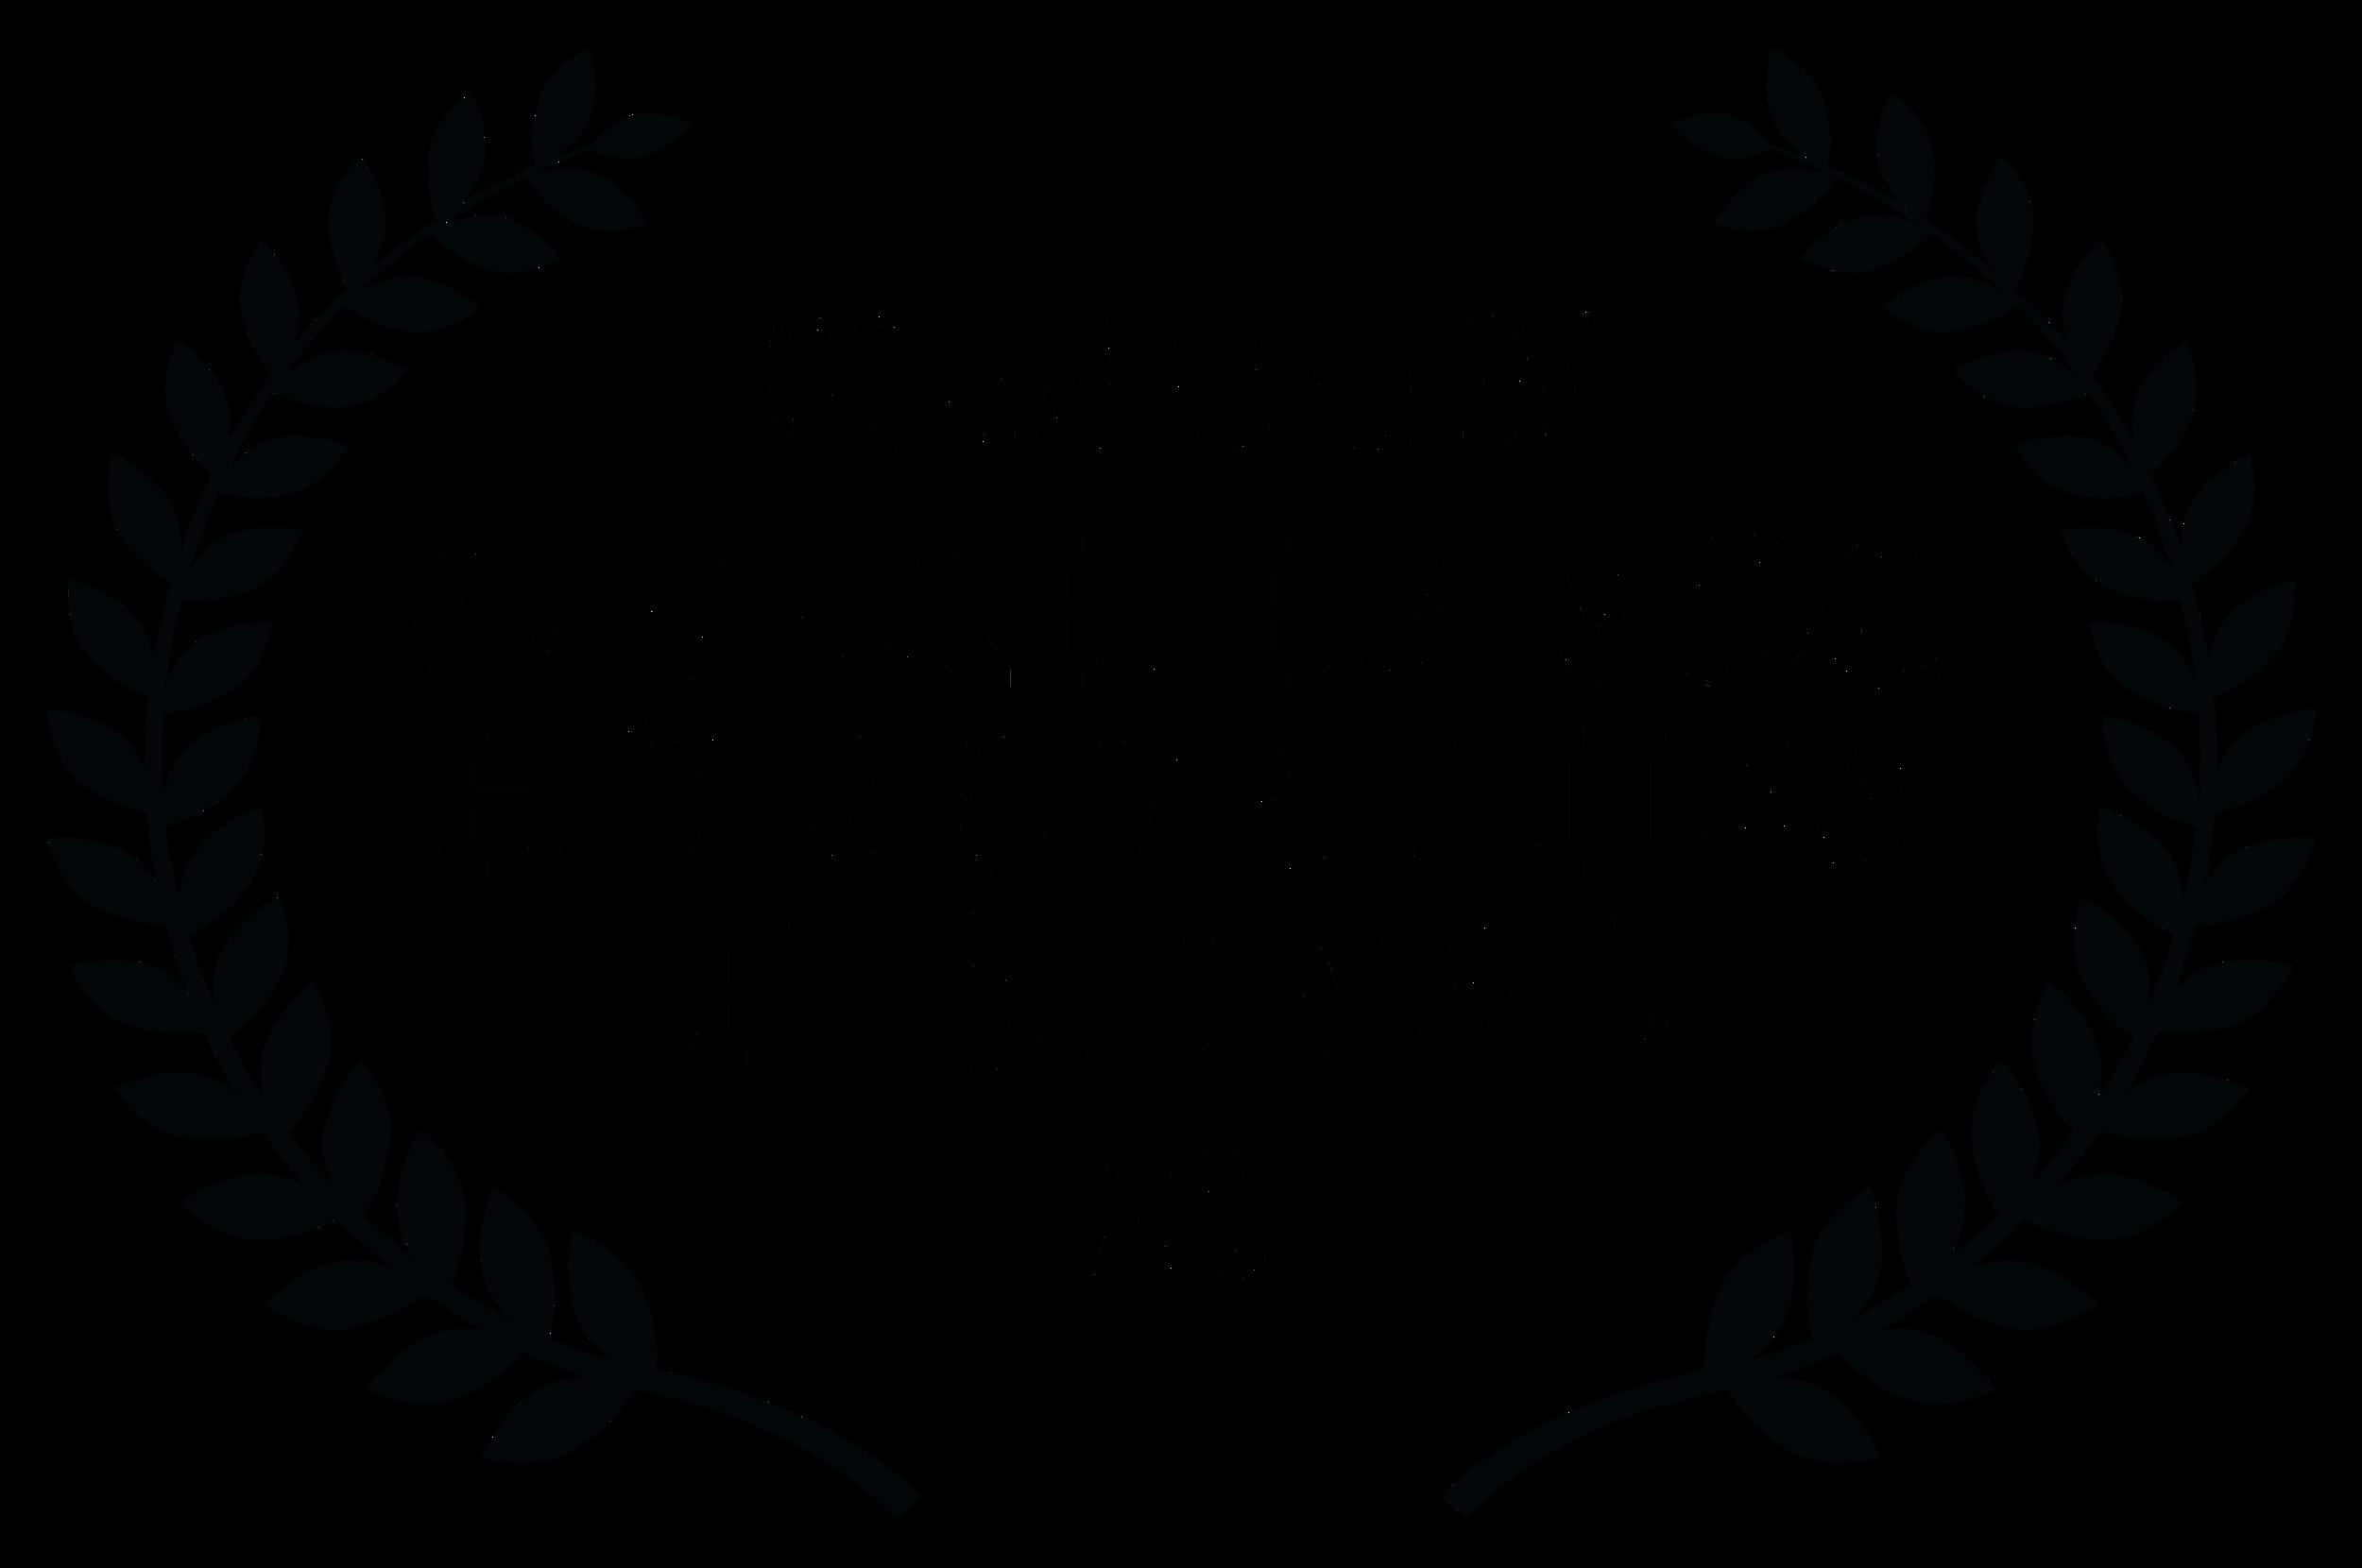 OFFICIALSELECTION-WREAKHAVOCHORRORFILMFESTIVAL-2018.png